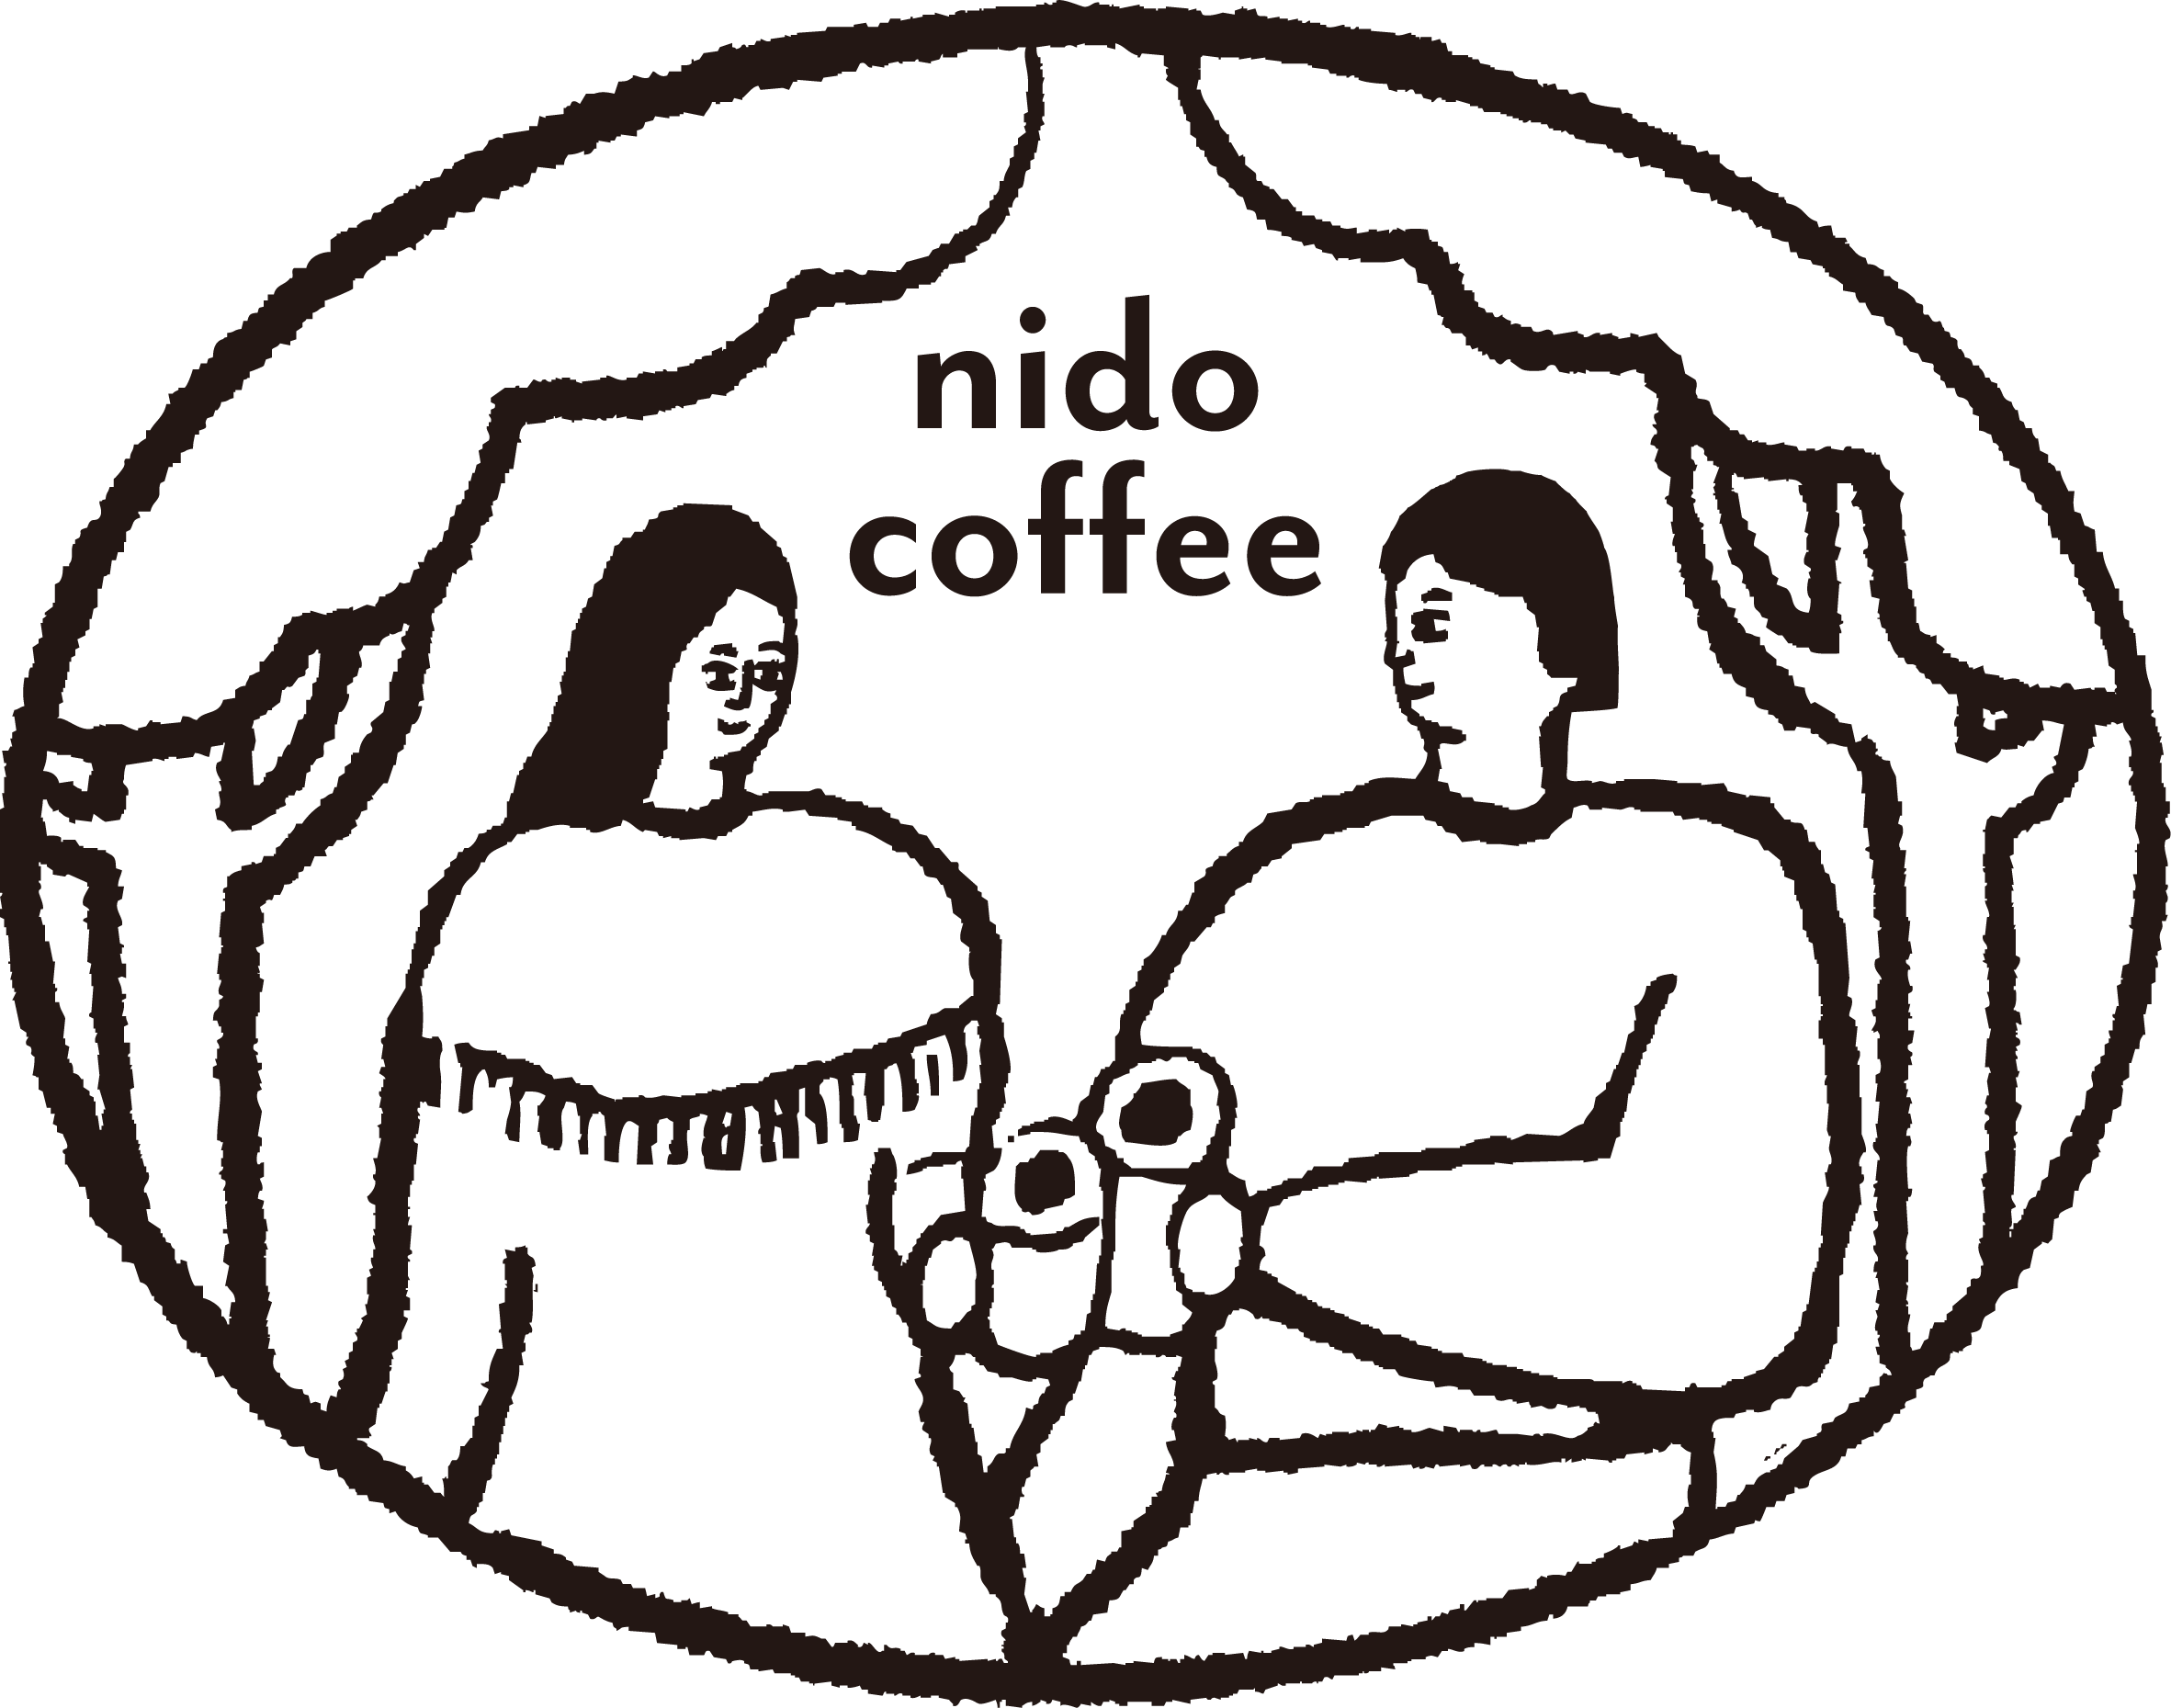 nido online shop